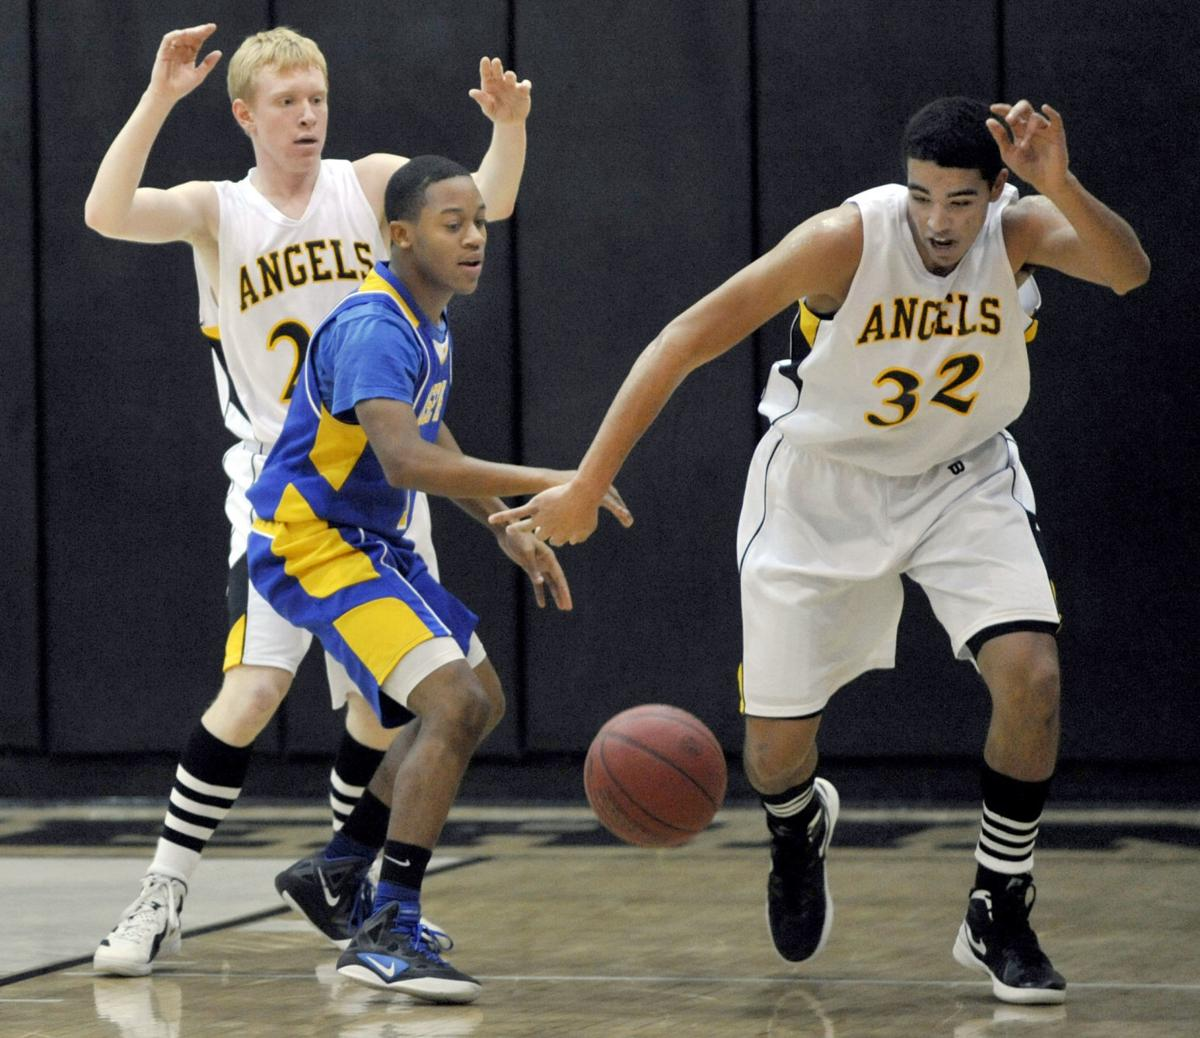 The Saints Basketball 03.jpg